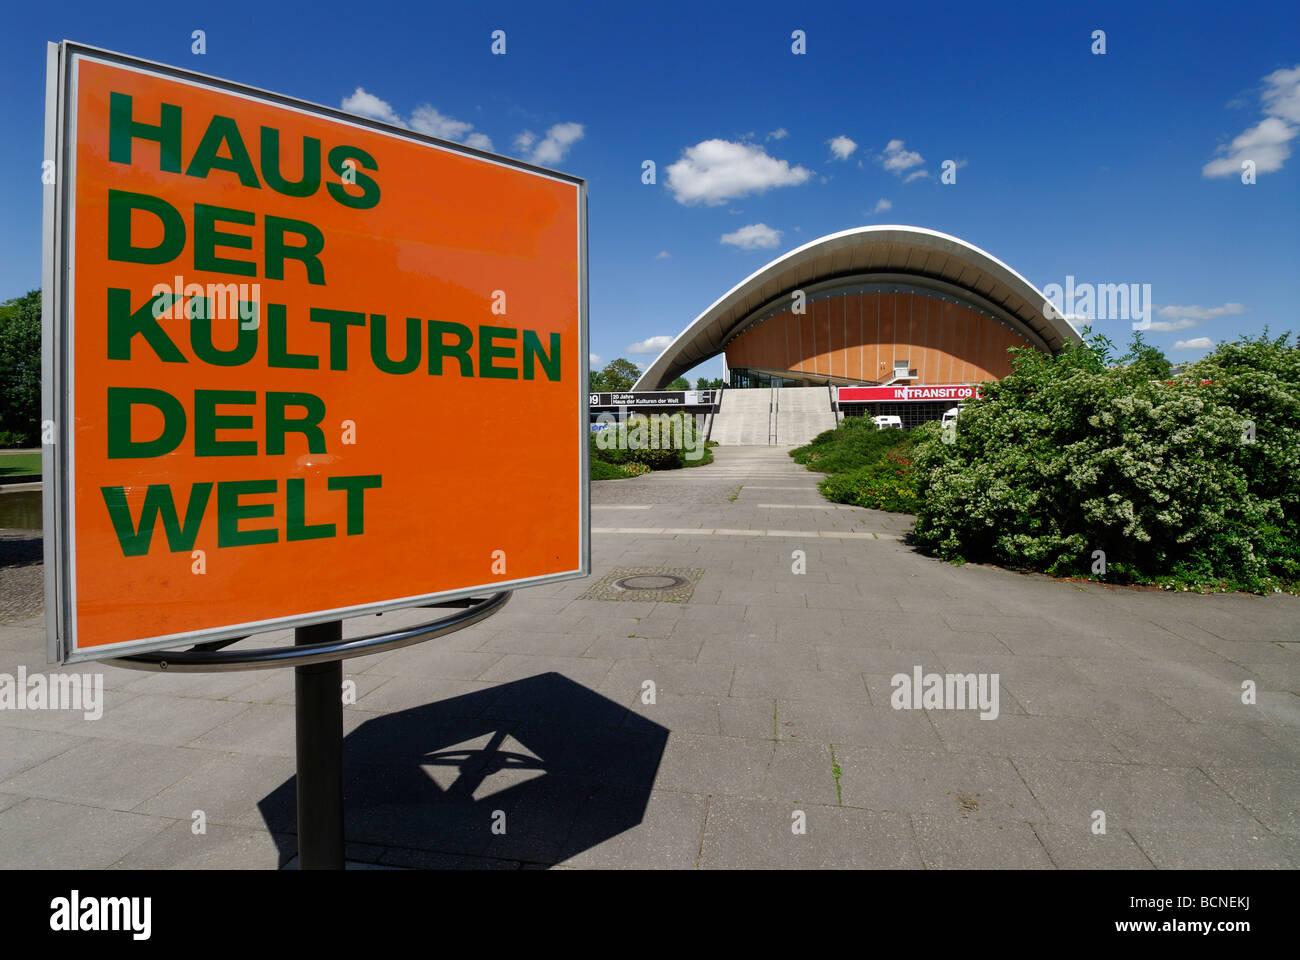 Berlin Germany Haus der Kulturen Der Welt House of World Cultures Designed in 1957 by American architect Hugh Stubbins - Stock Image